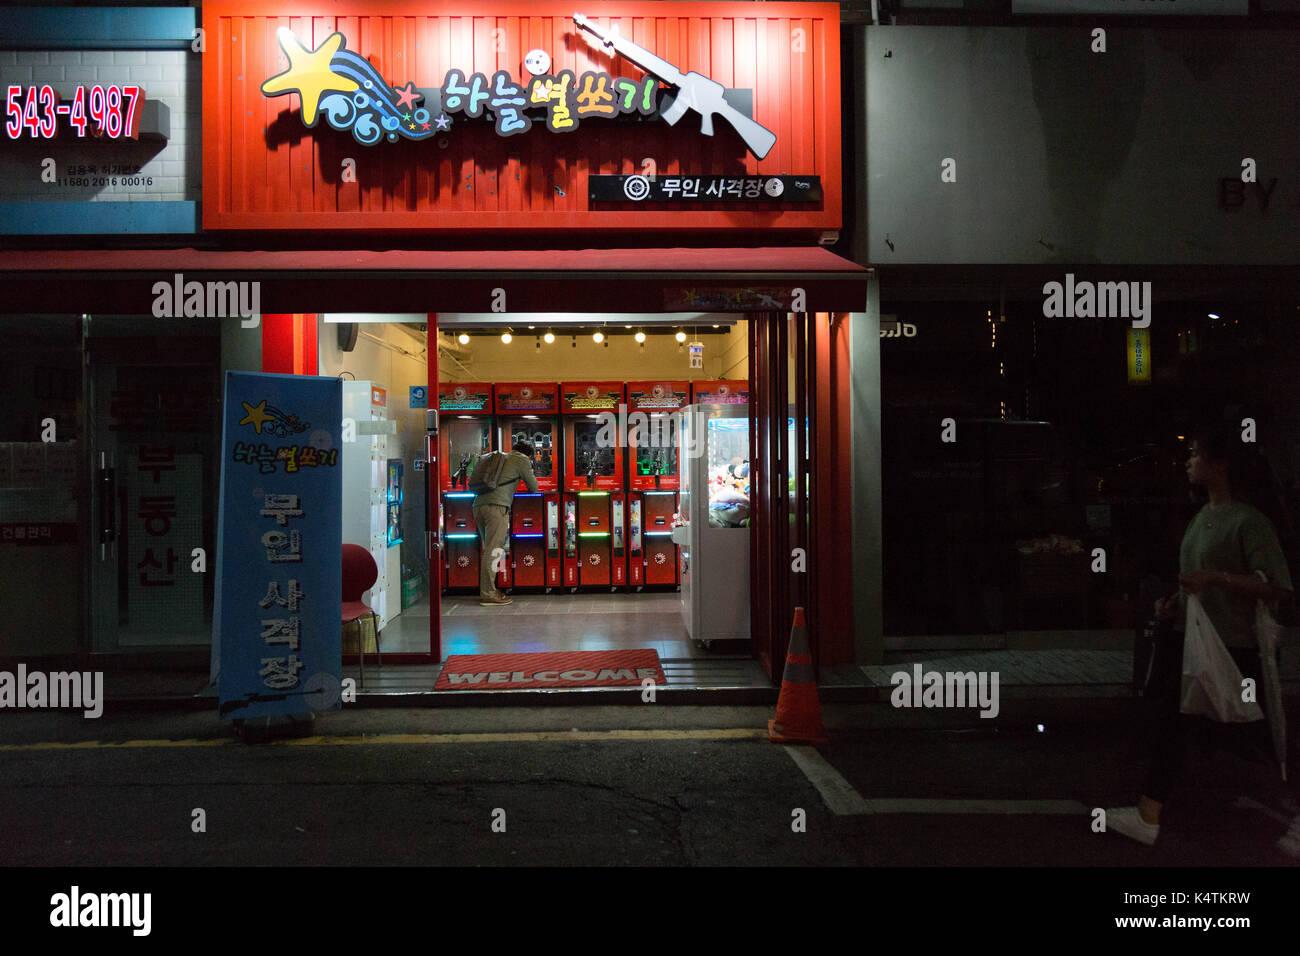 A man plays alone at the arcade shooting range after dark in Sinsa-dog, Gangnum-gu, Seoul, South Korea. - Stock Image